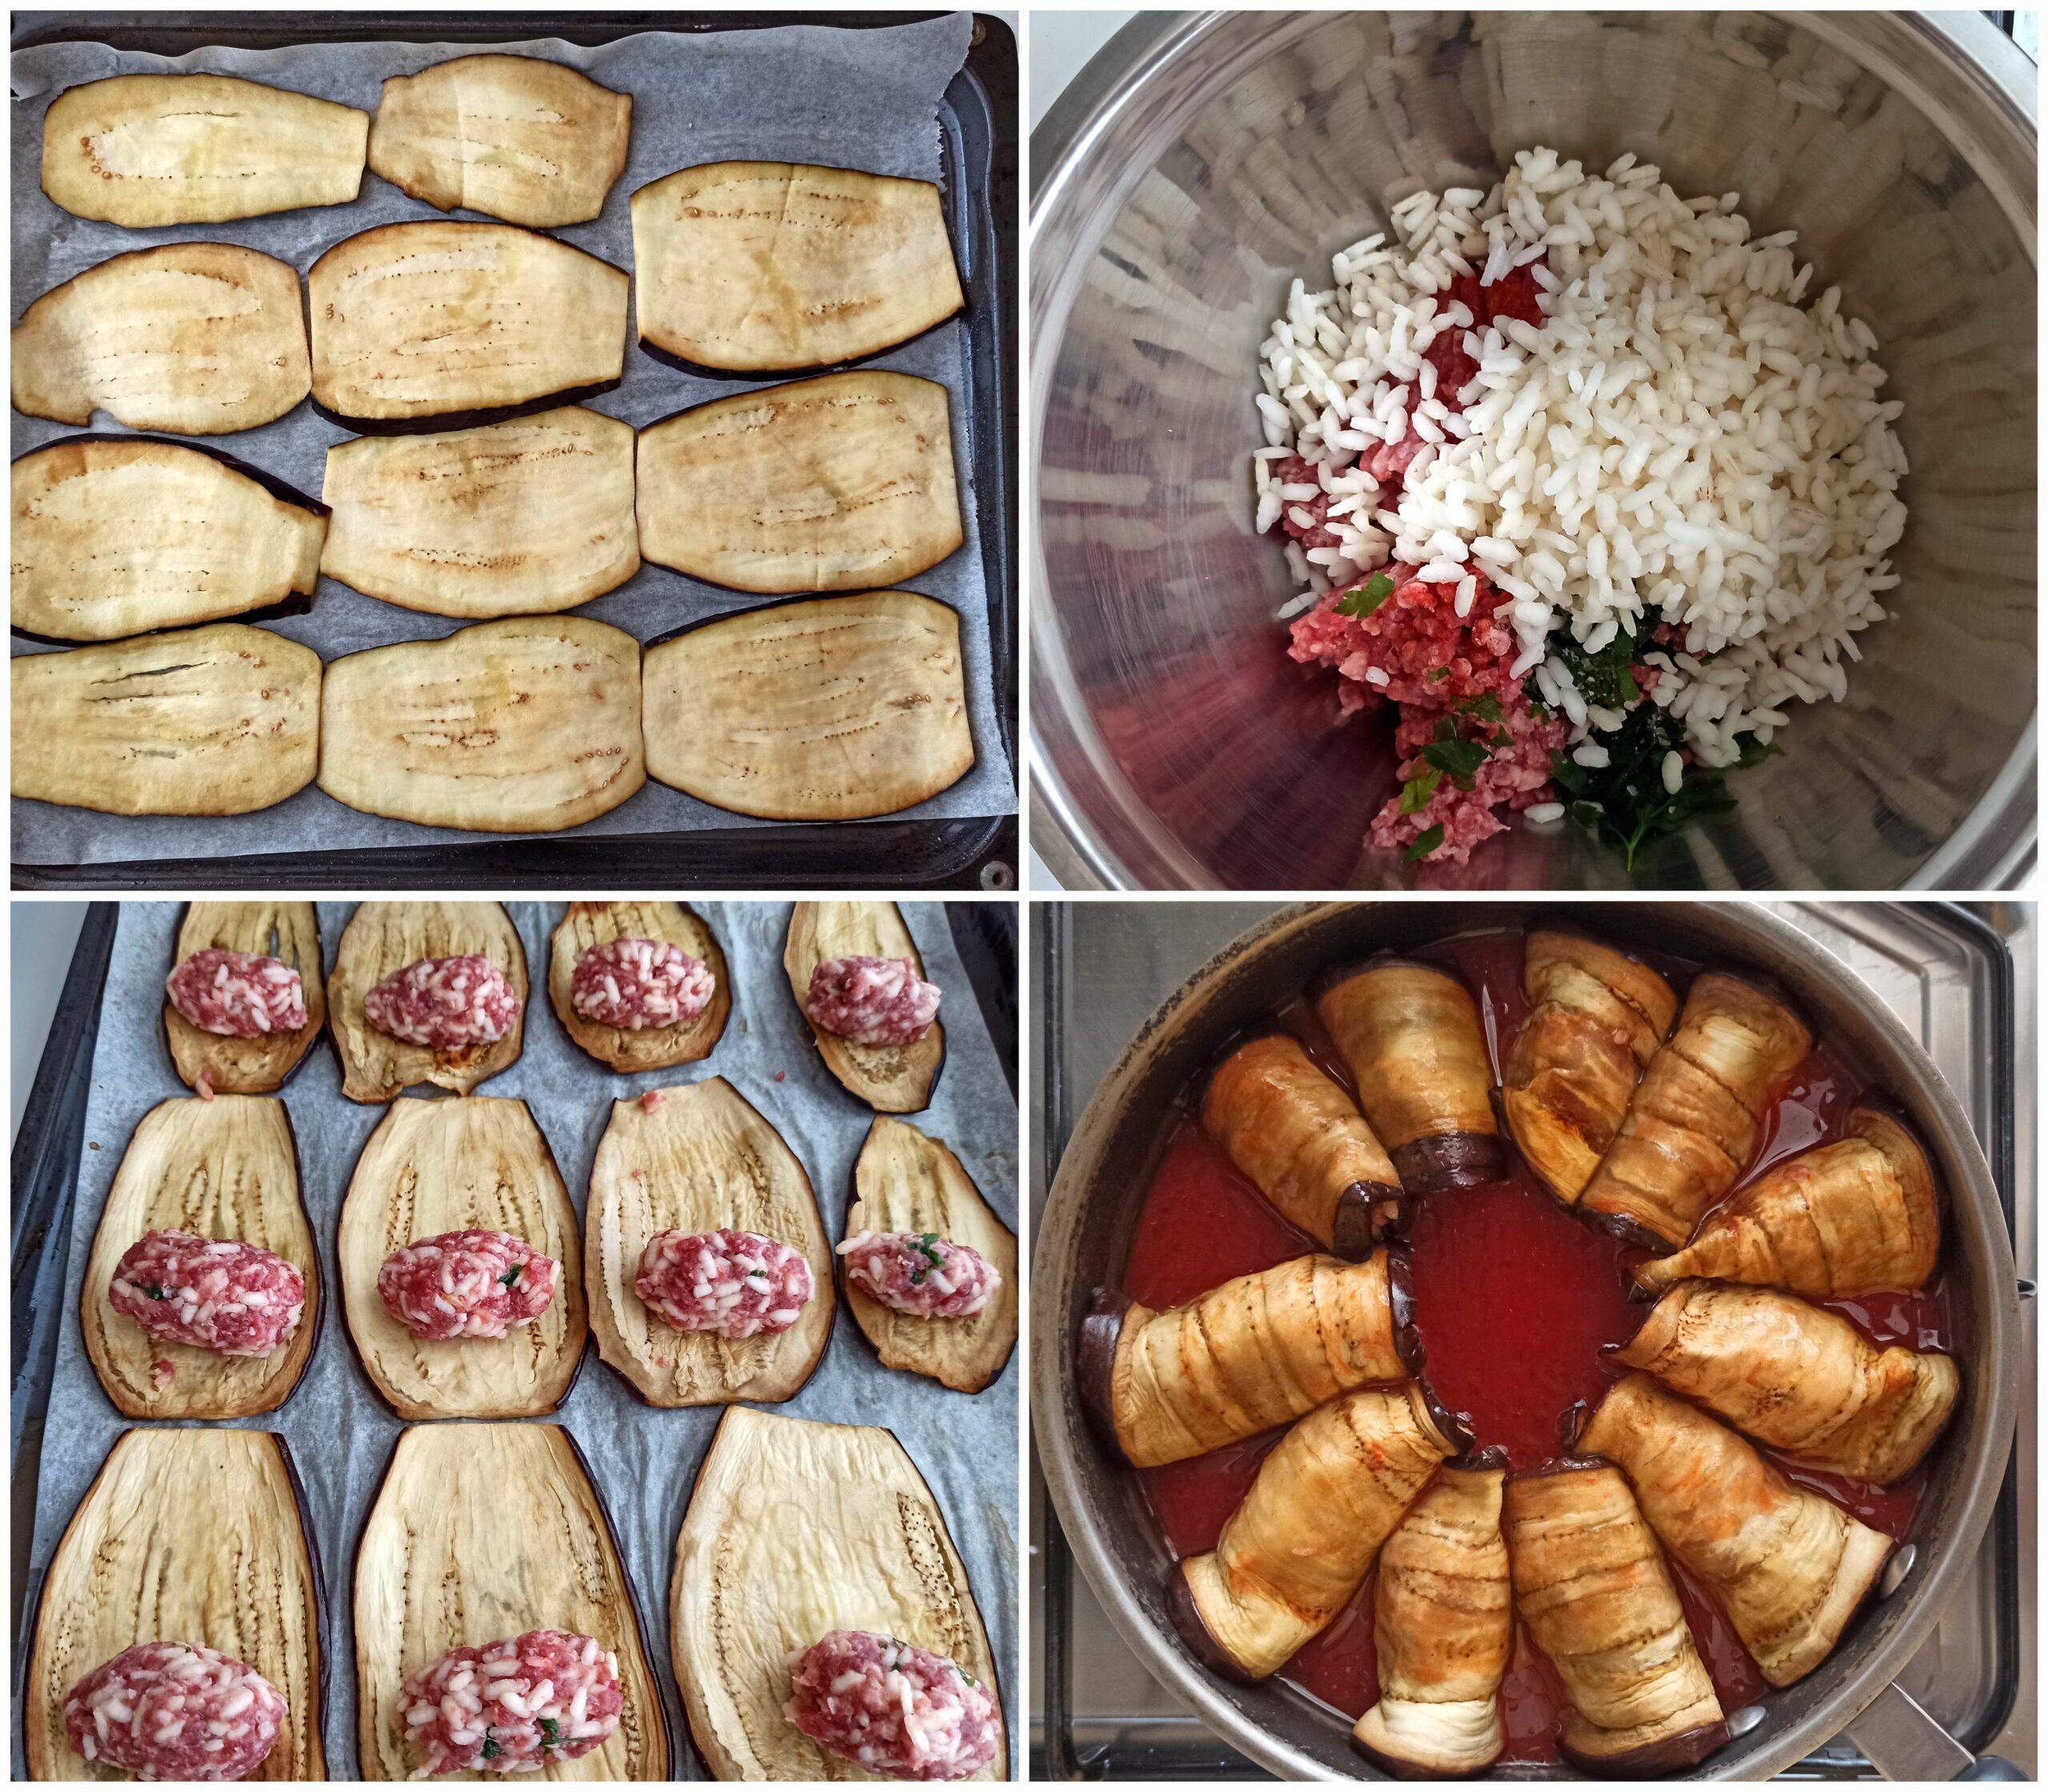 Roulades d'aubergine avac la viande - La Cassata Celiaca